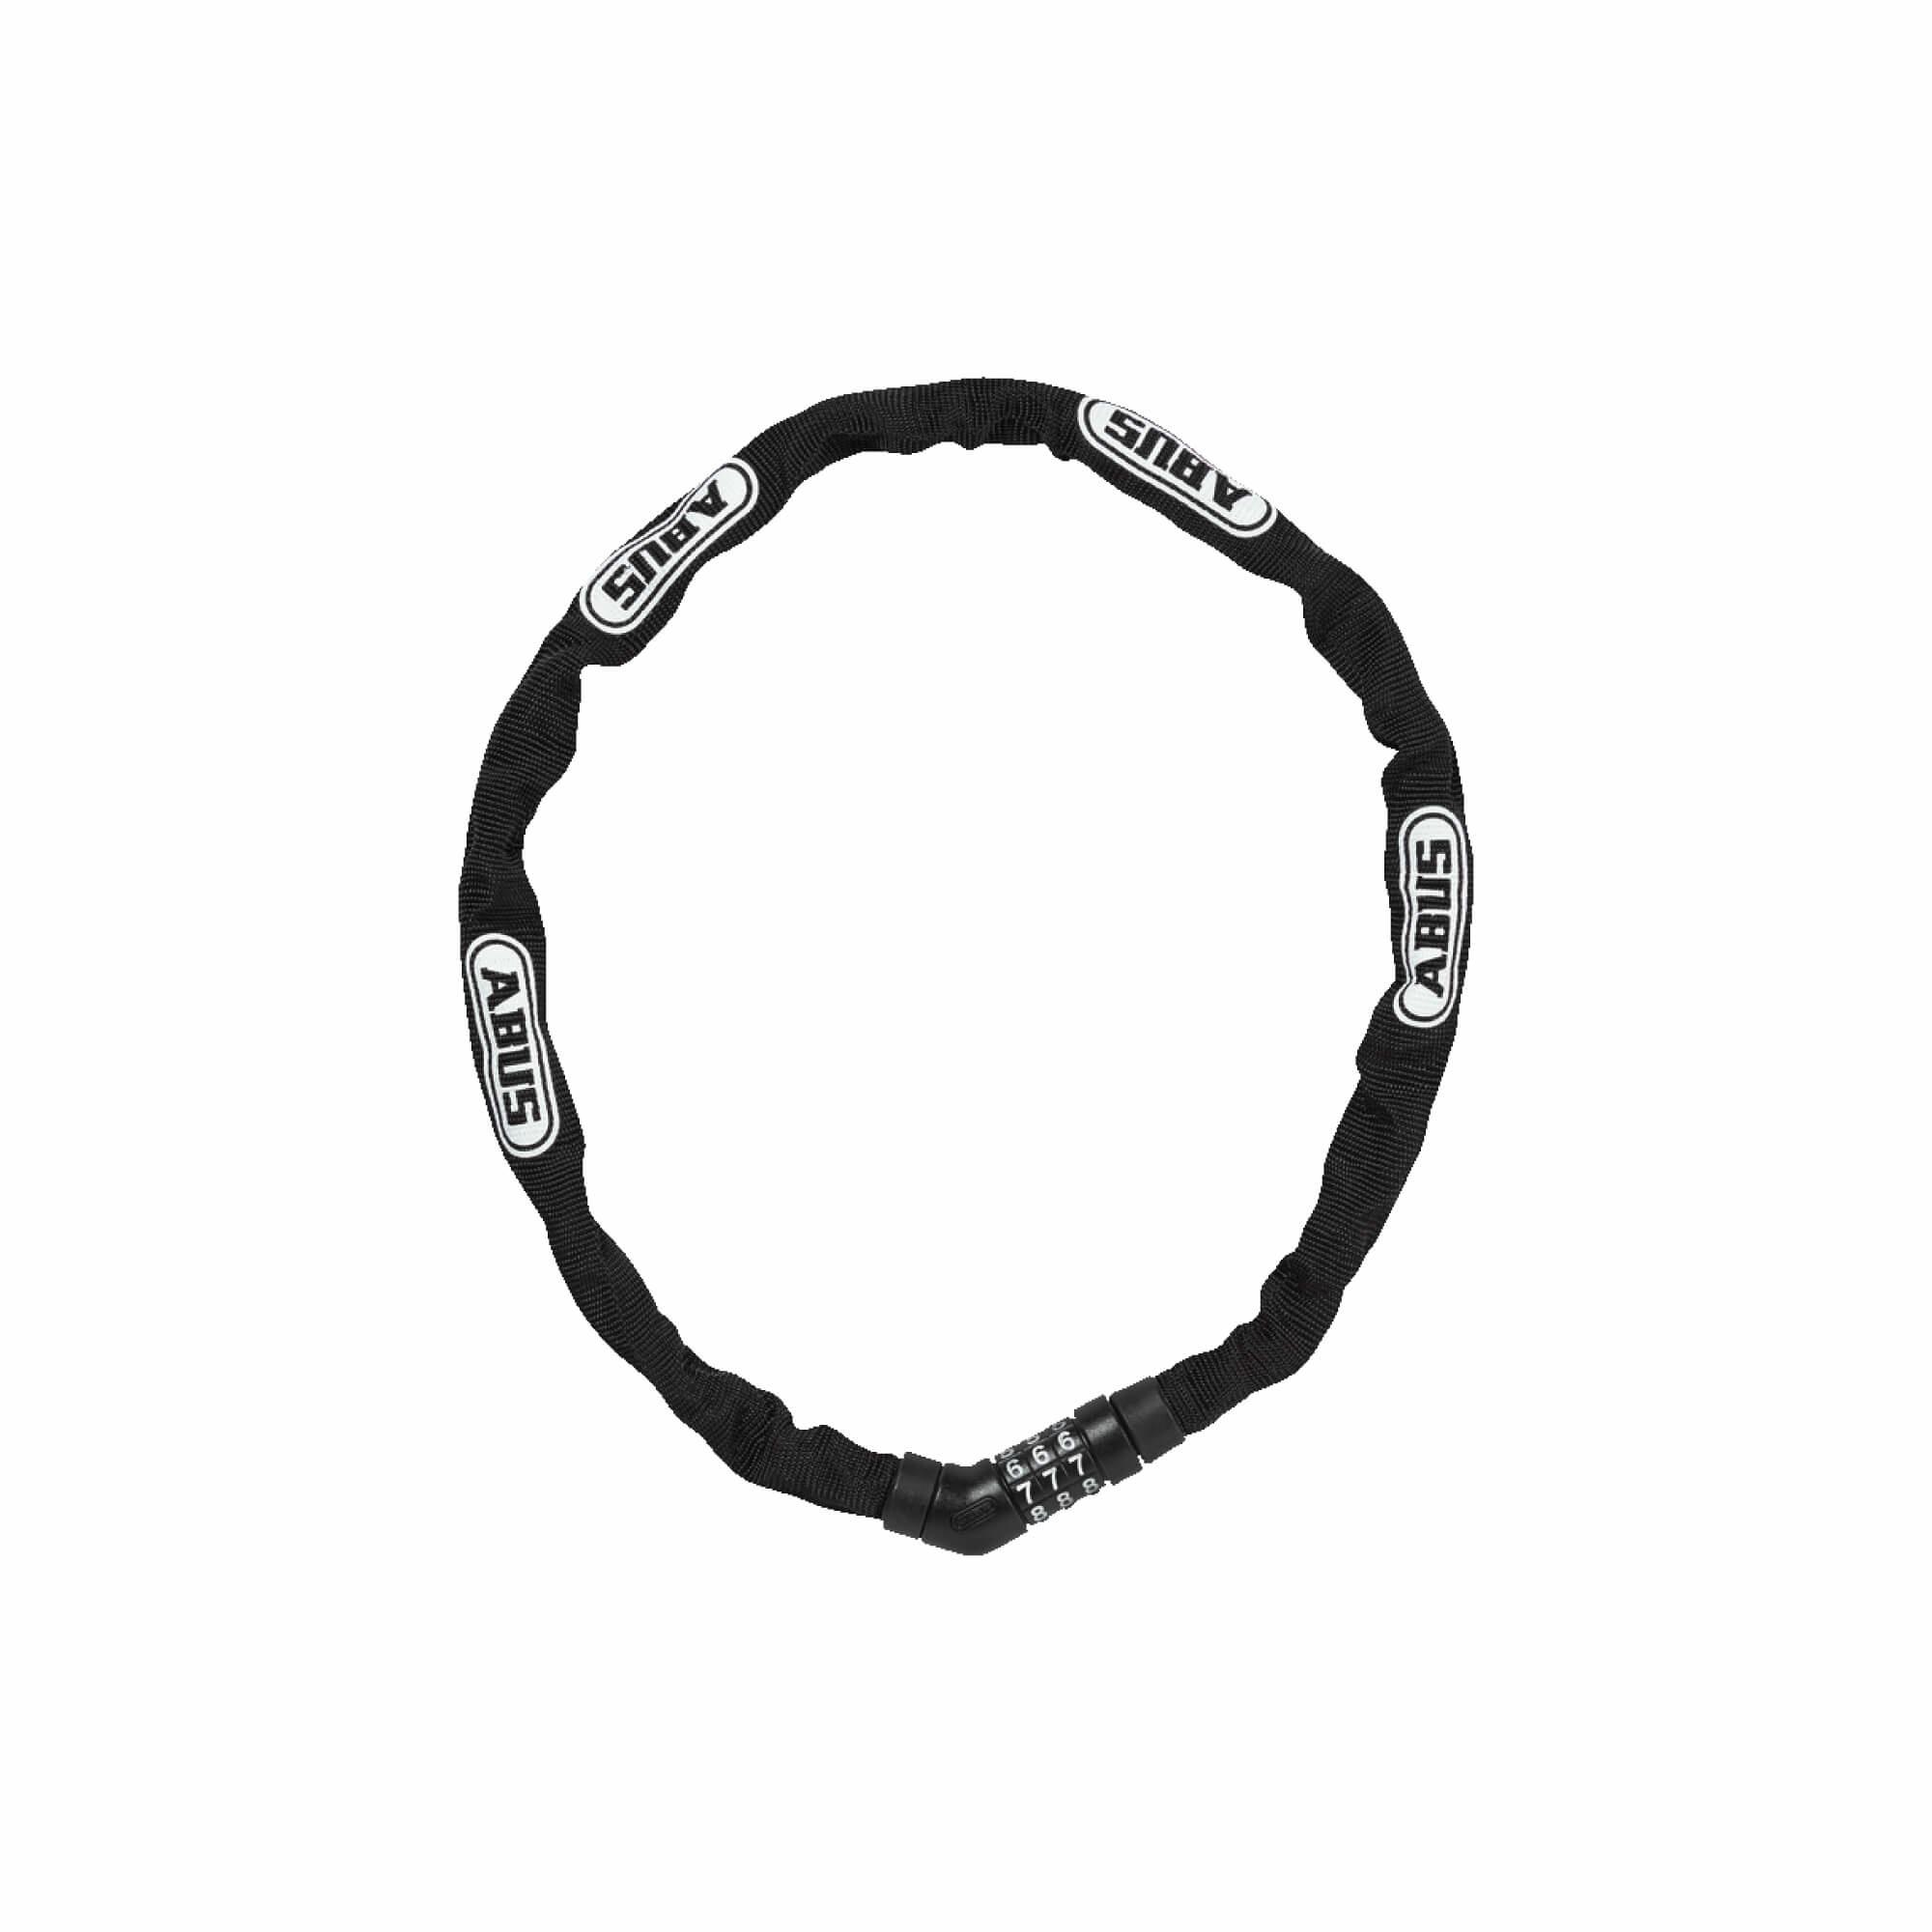 Lock Chain Combo 4804 75cm-1